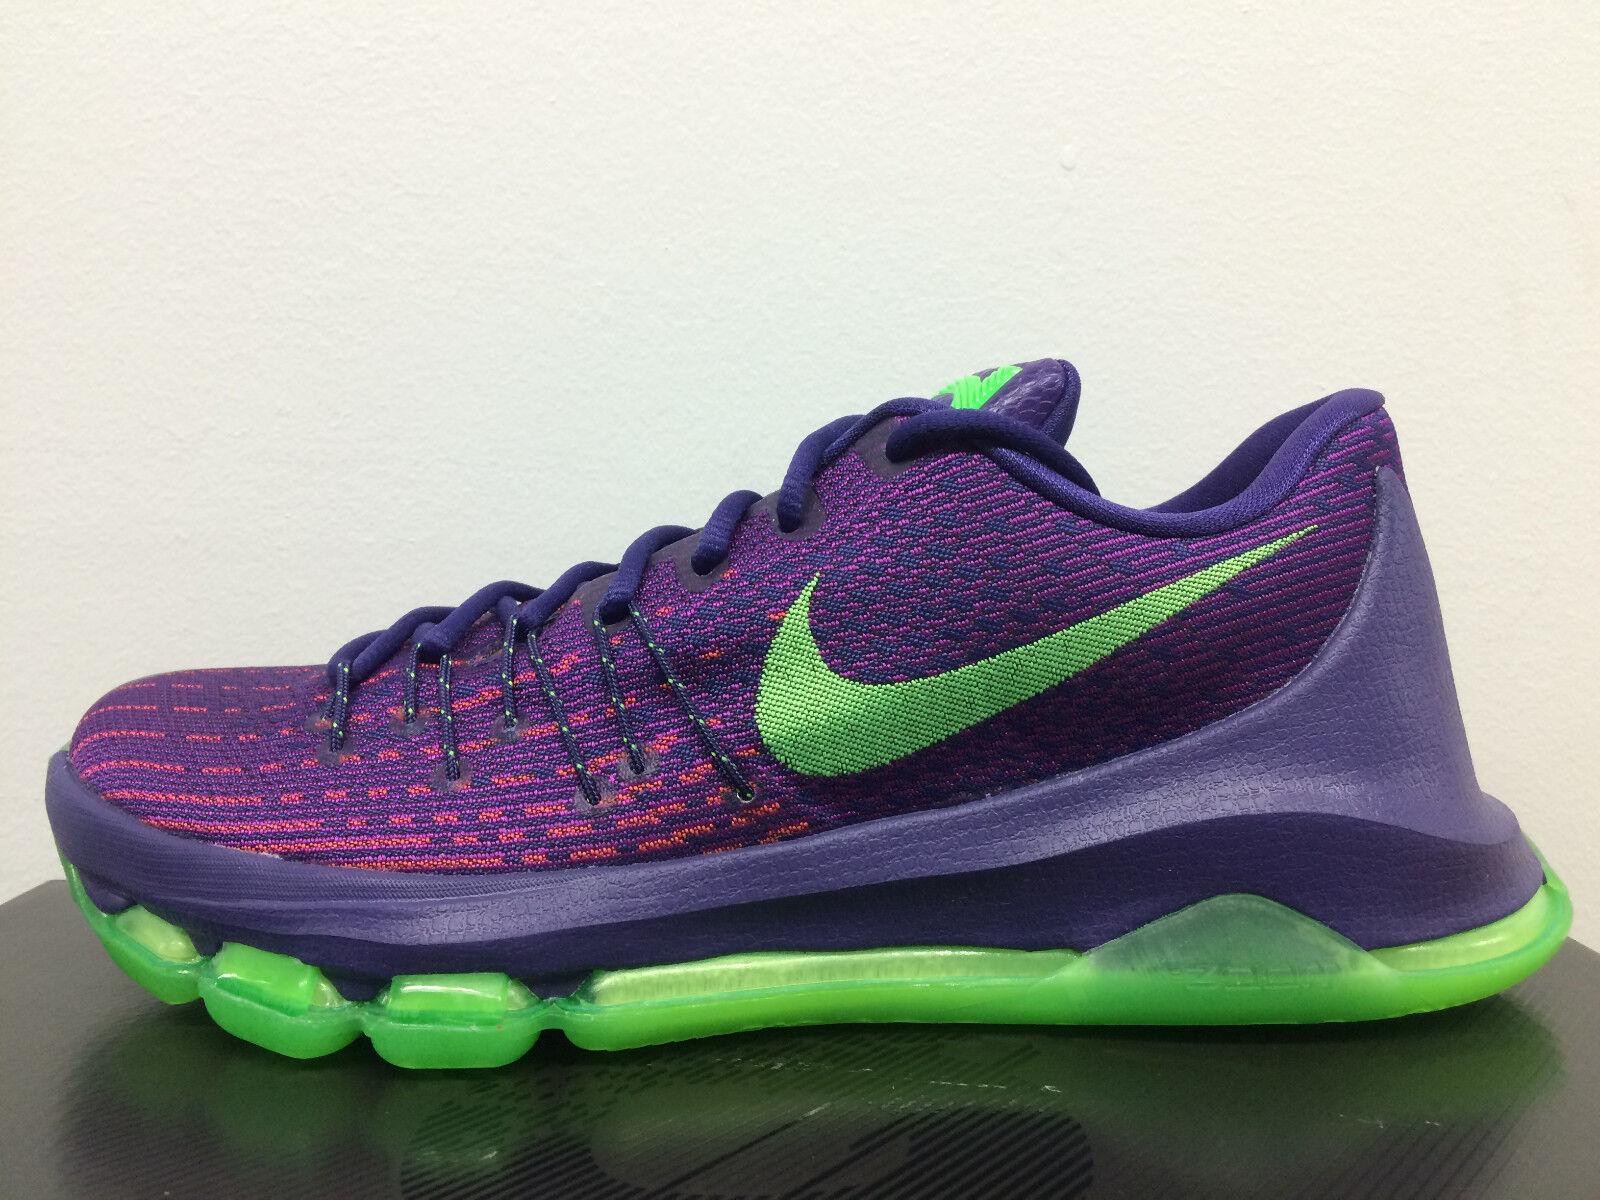 Nike KD 8 Suit Court Purple Green 749375-535 7-13  supreme 7 6 premium